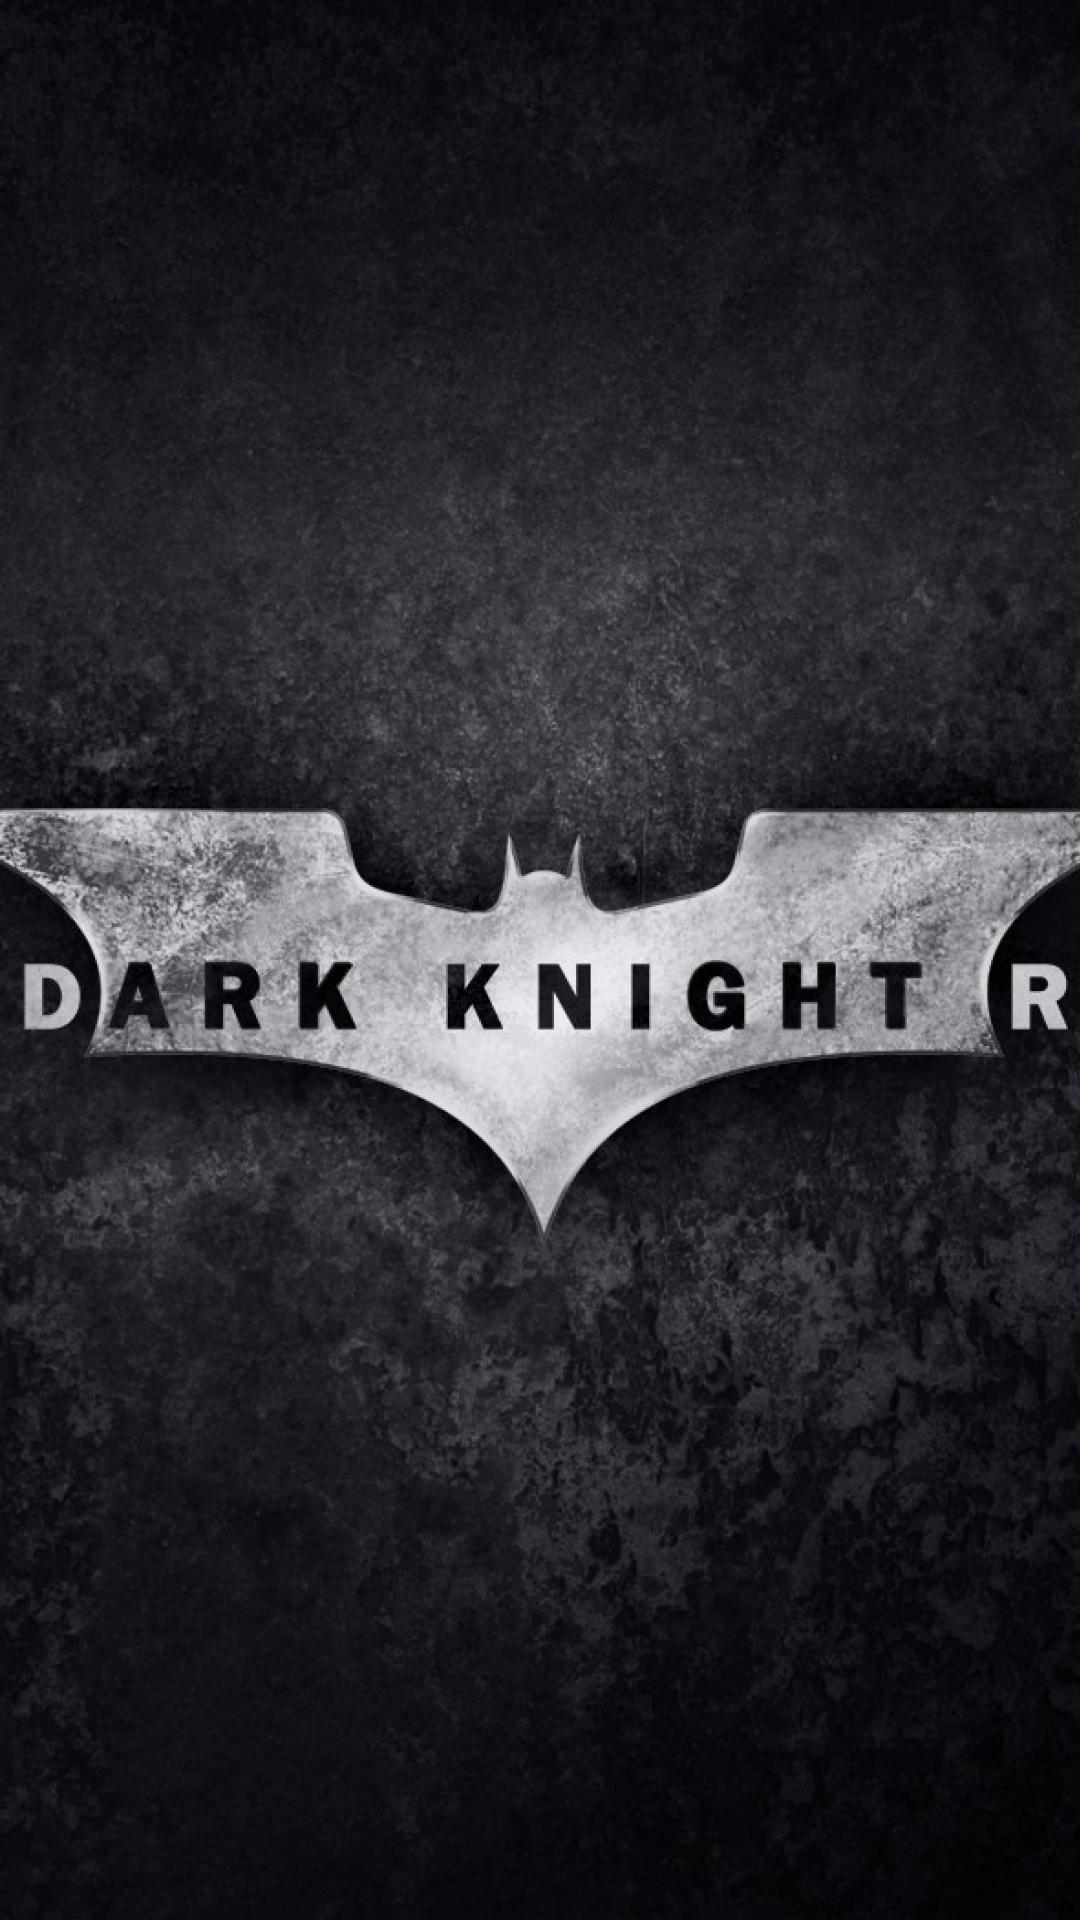 Batman Logos The Dark Knight Rises Logo Wallpaper 64114 1080x1920